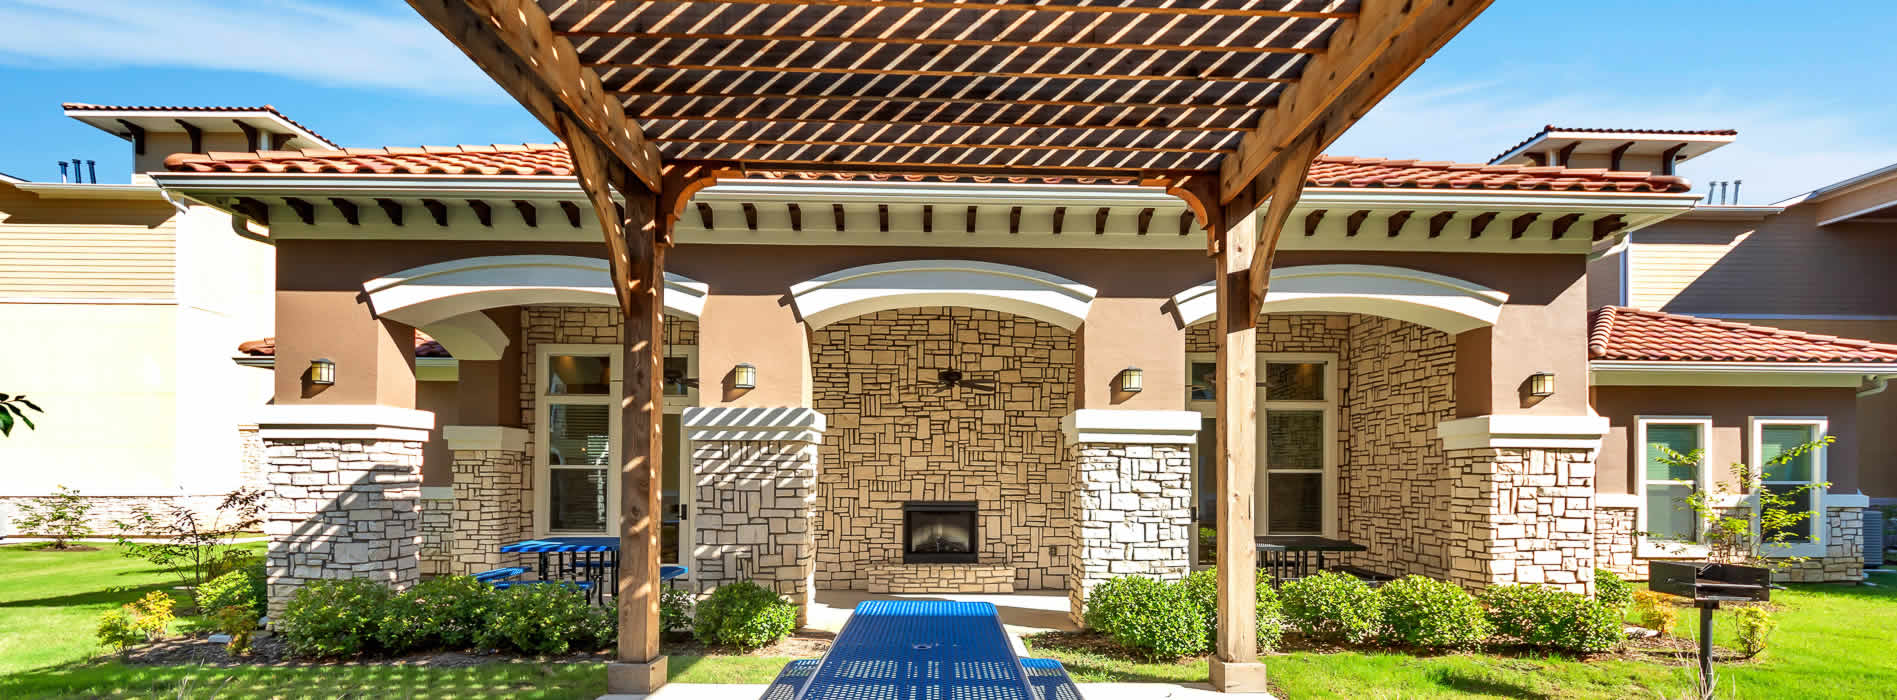 Royal Gardens Apartments | Mineral Wells, TX | (940) 468-2970